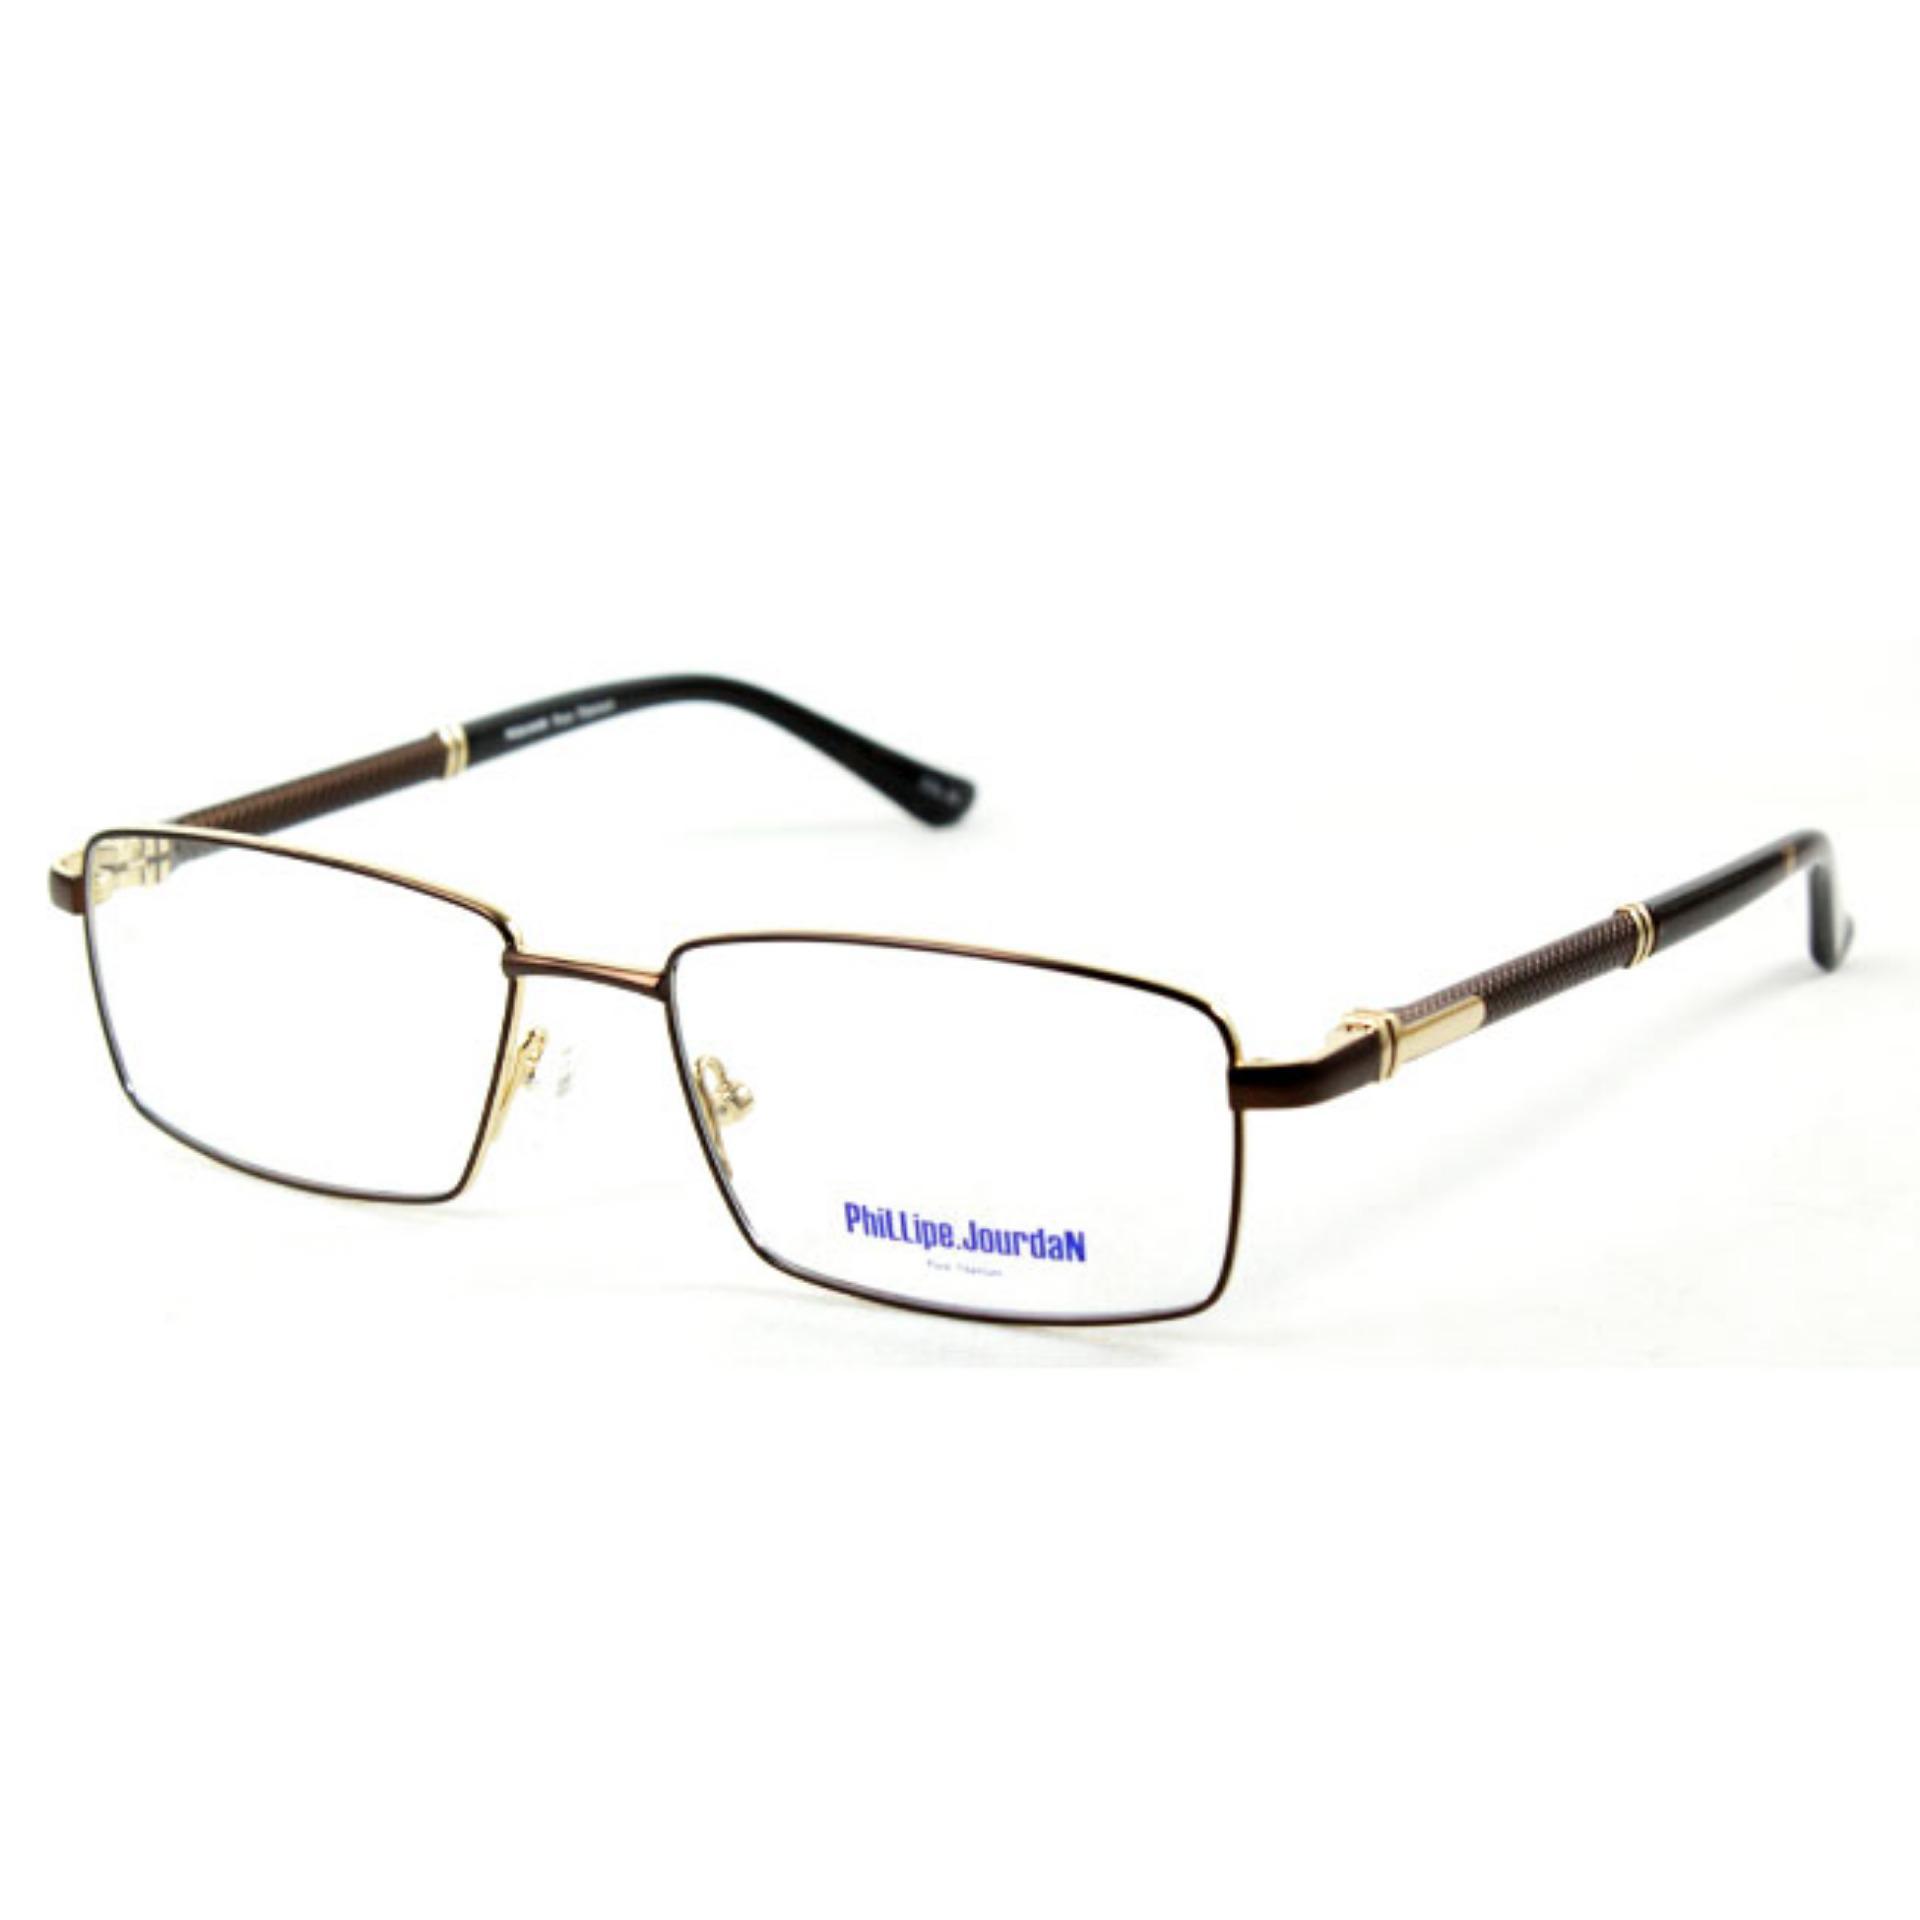 Fashion Stallane miopia bingkai kacamata Optik kacamata polos aluminium kacamata setengah bingkai kacamata bisnis untuk pria. Source · Frame Kacamata Pure ...